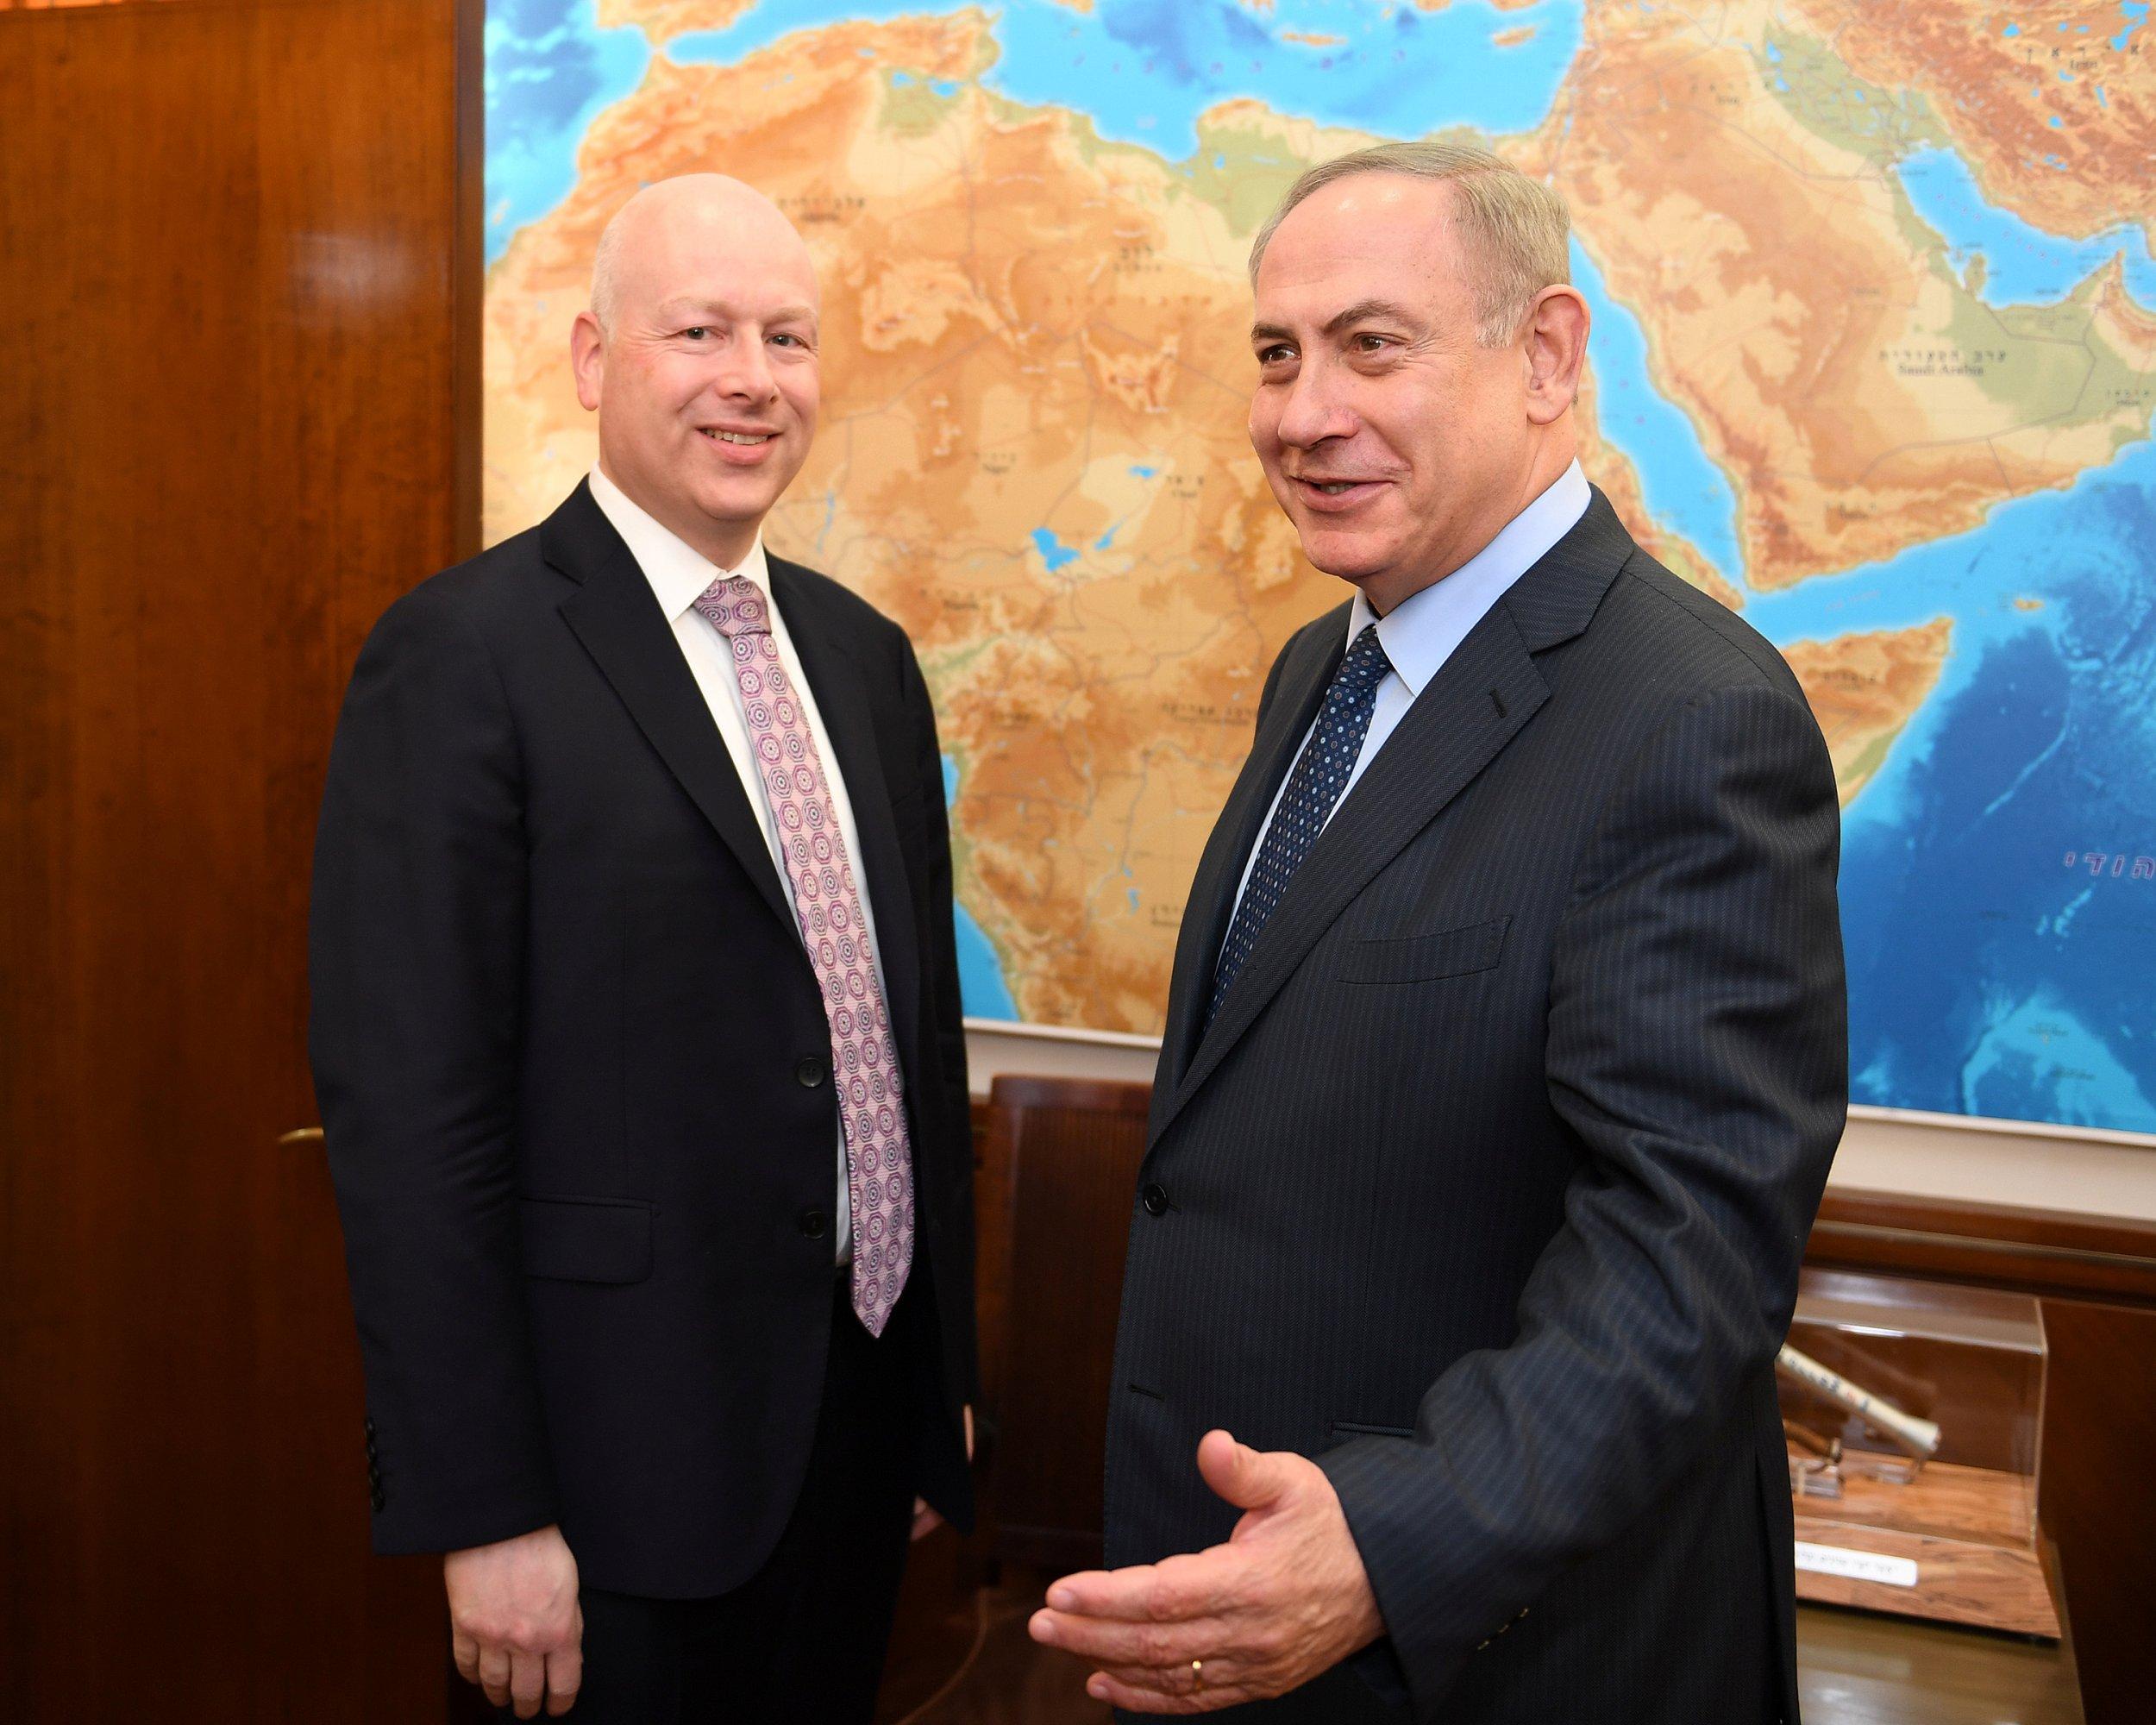 03_31_Greenblatt_Netanyahu_01